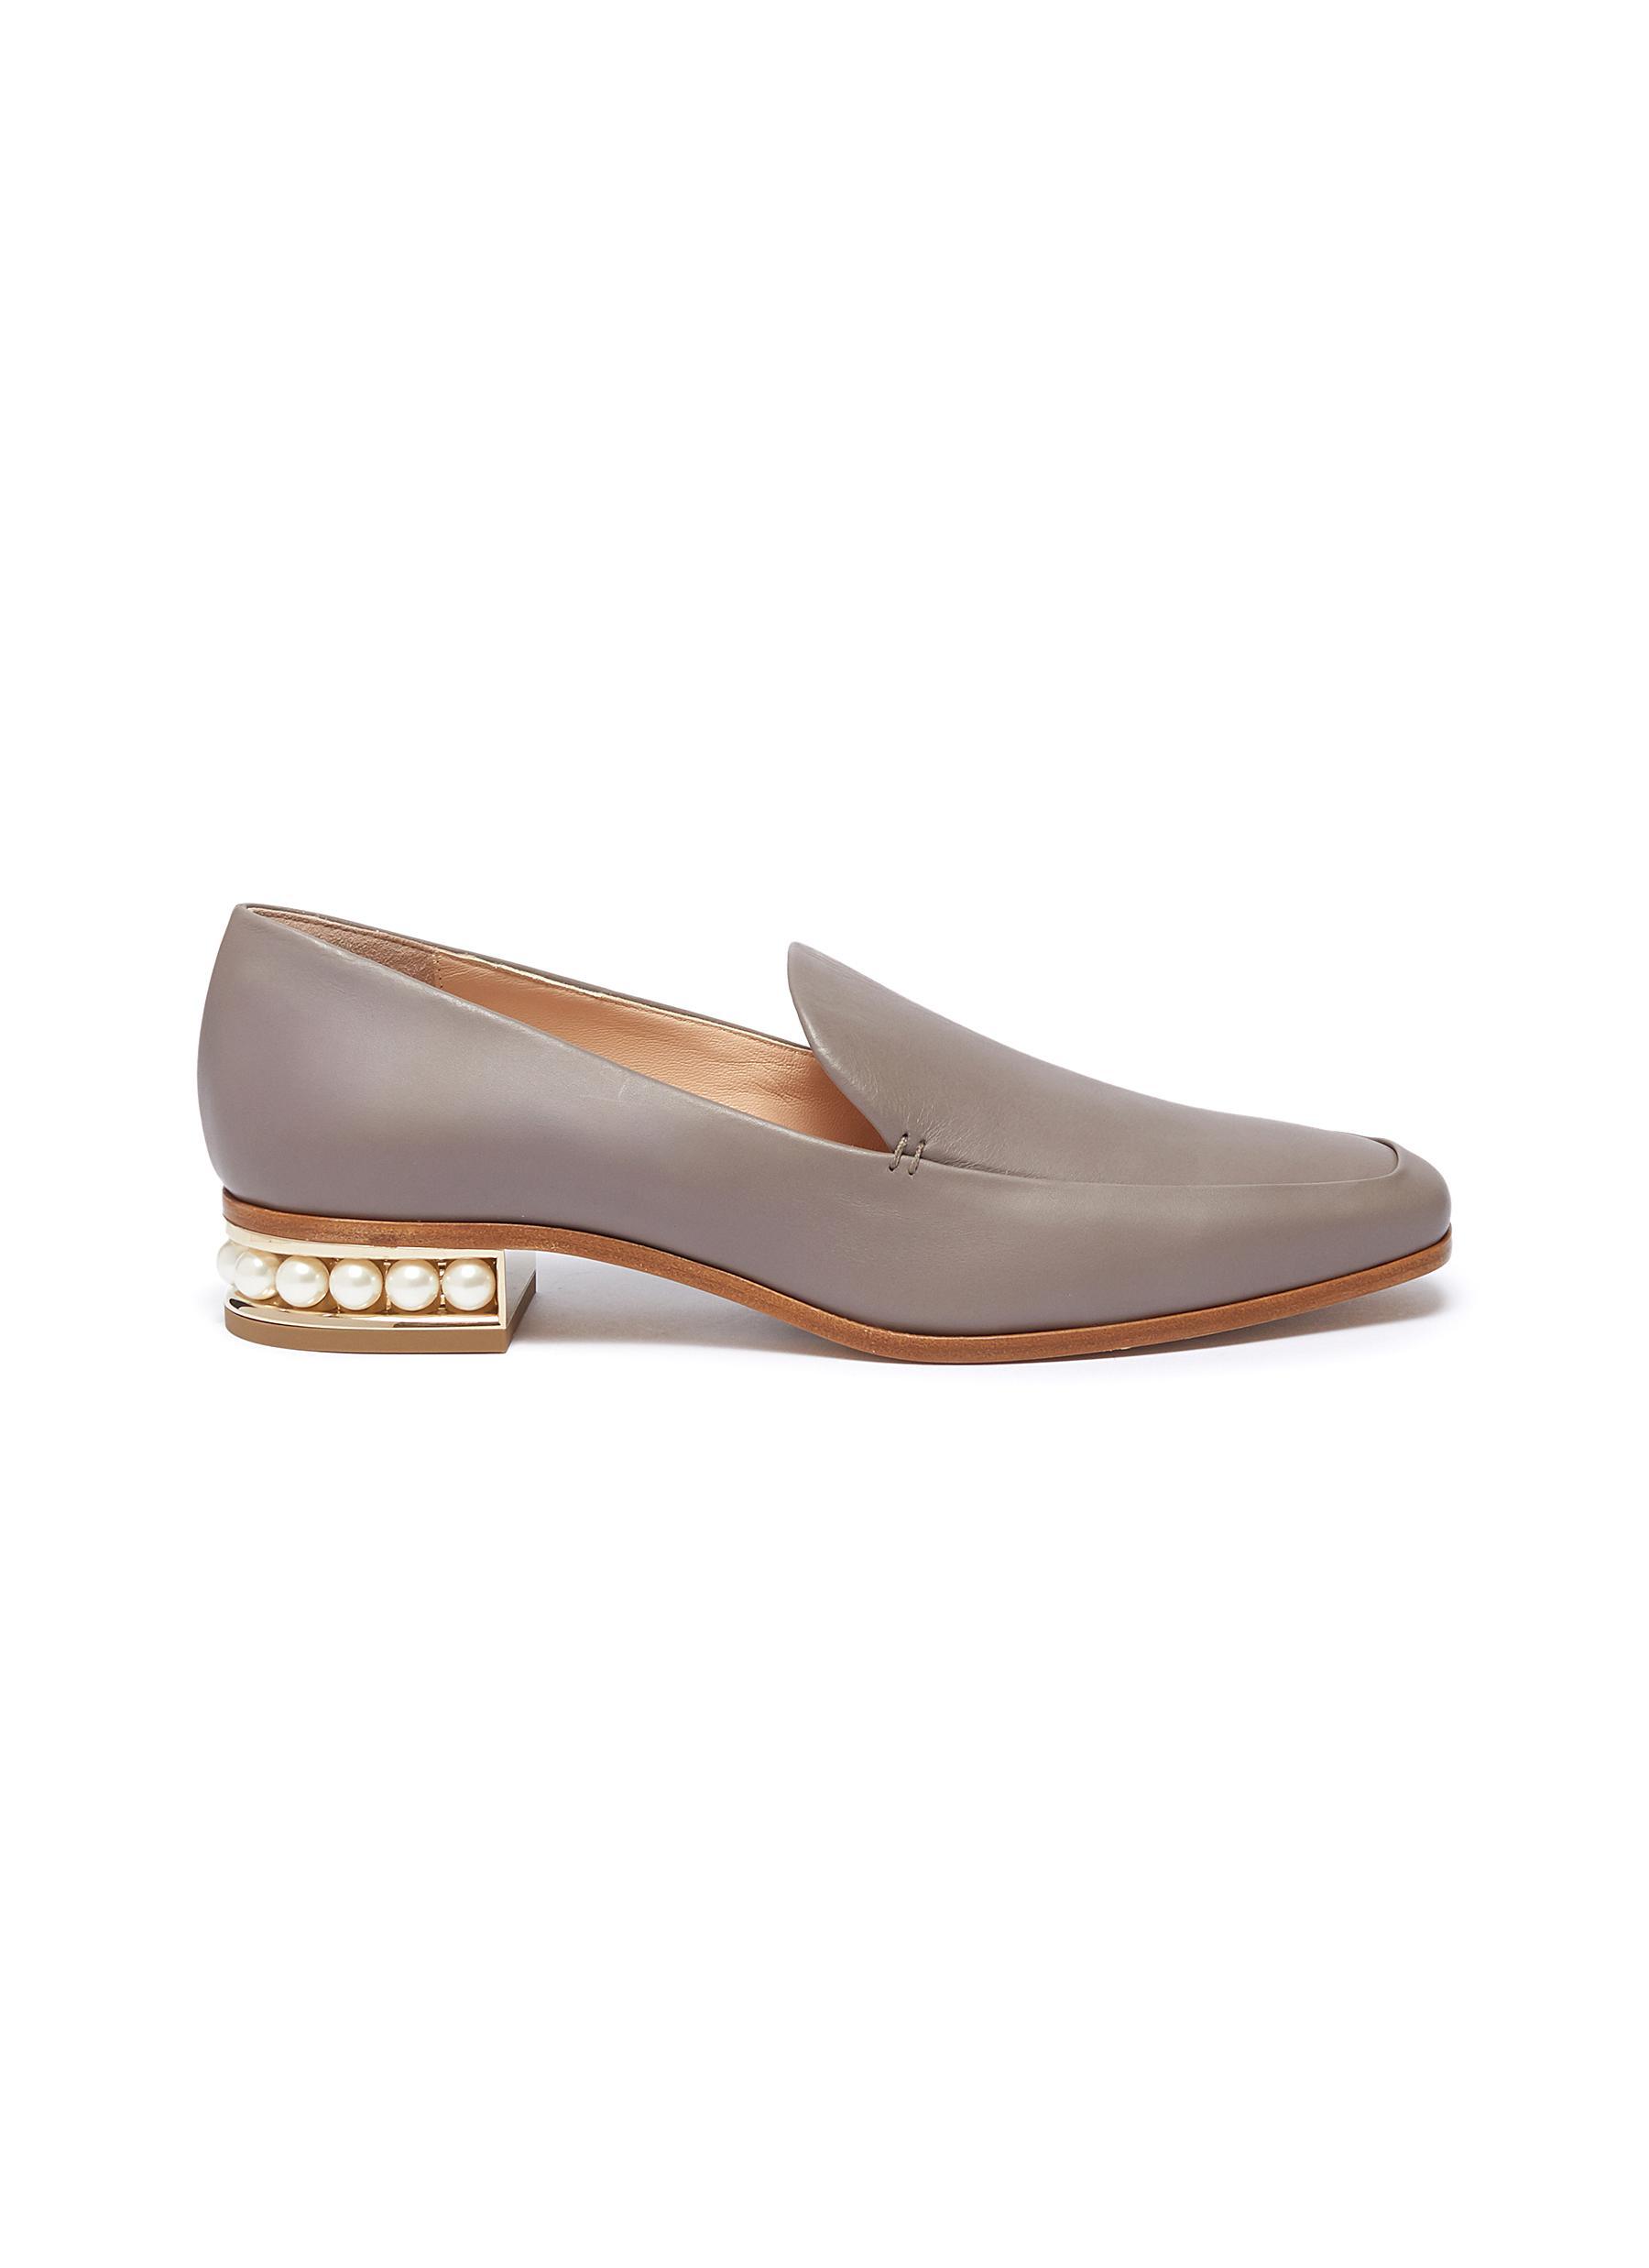 Nicholas Kirkwood Flats Casati faux pearl heel leather moccasins